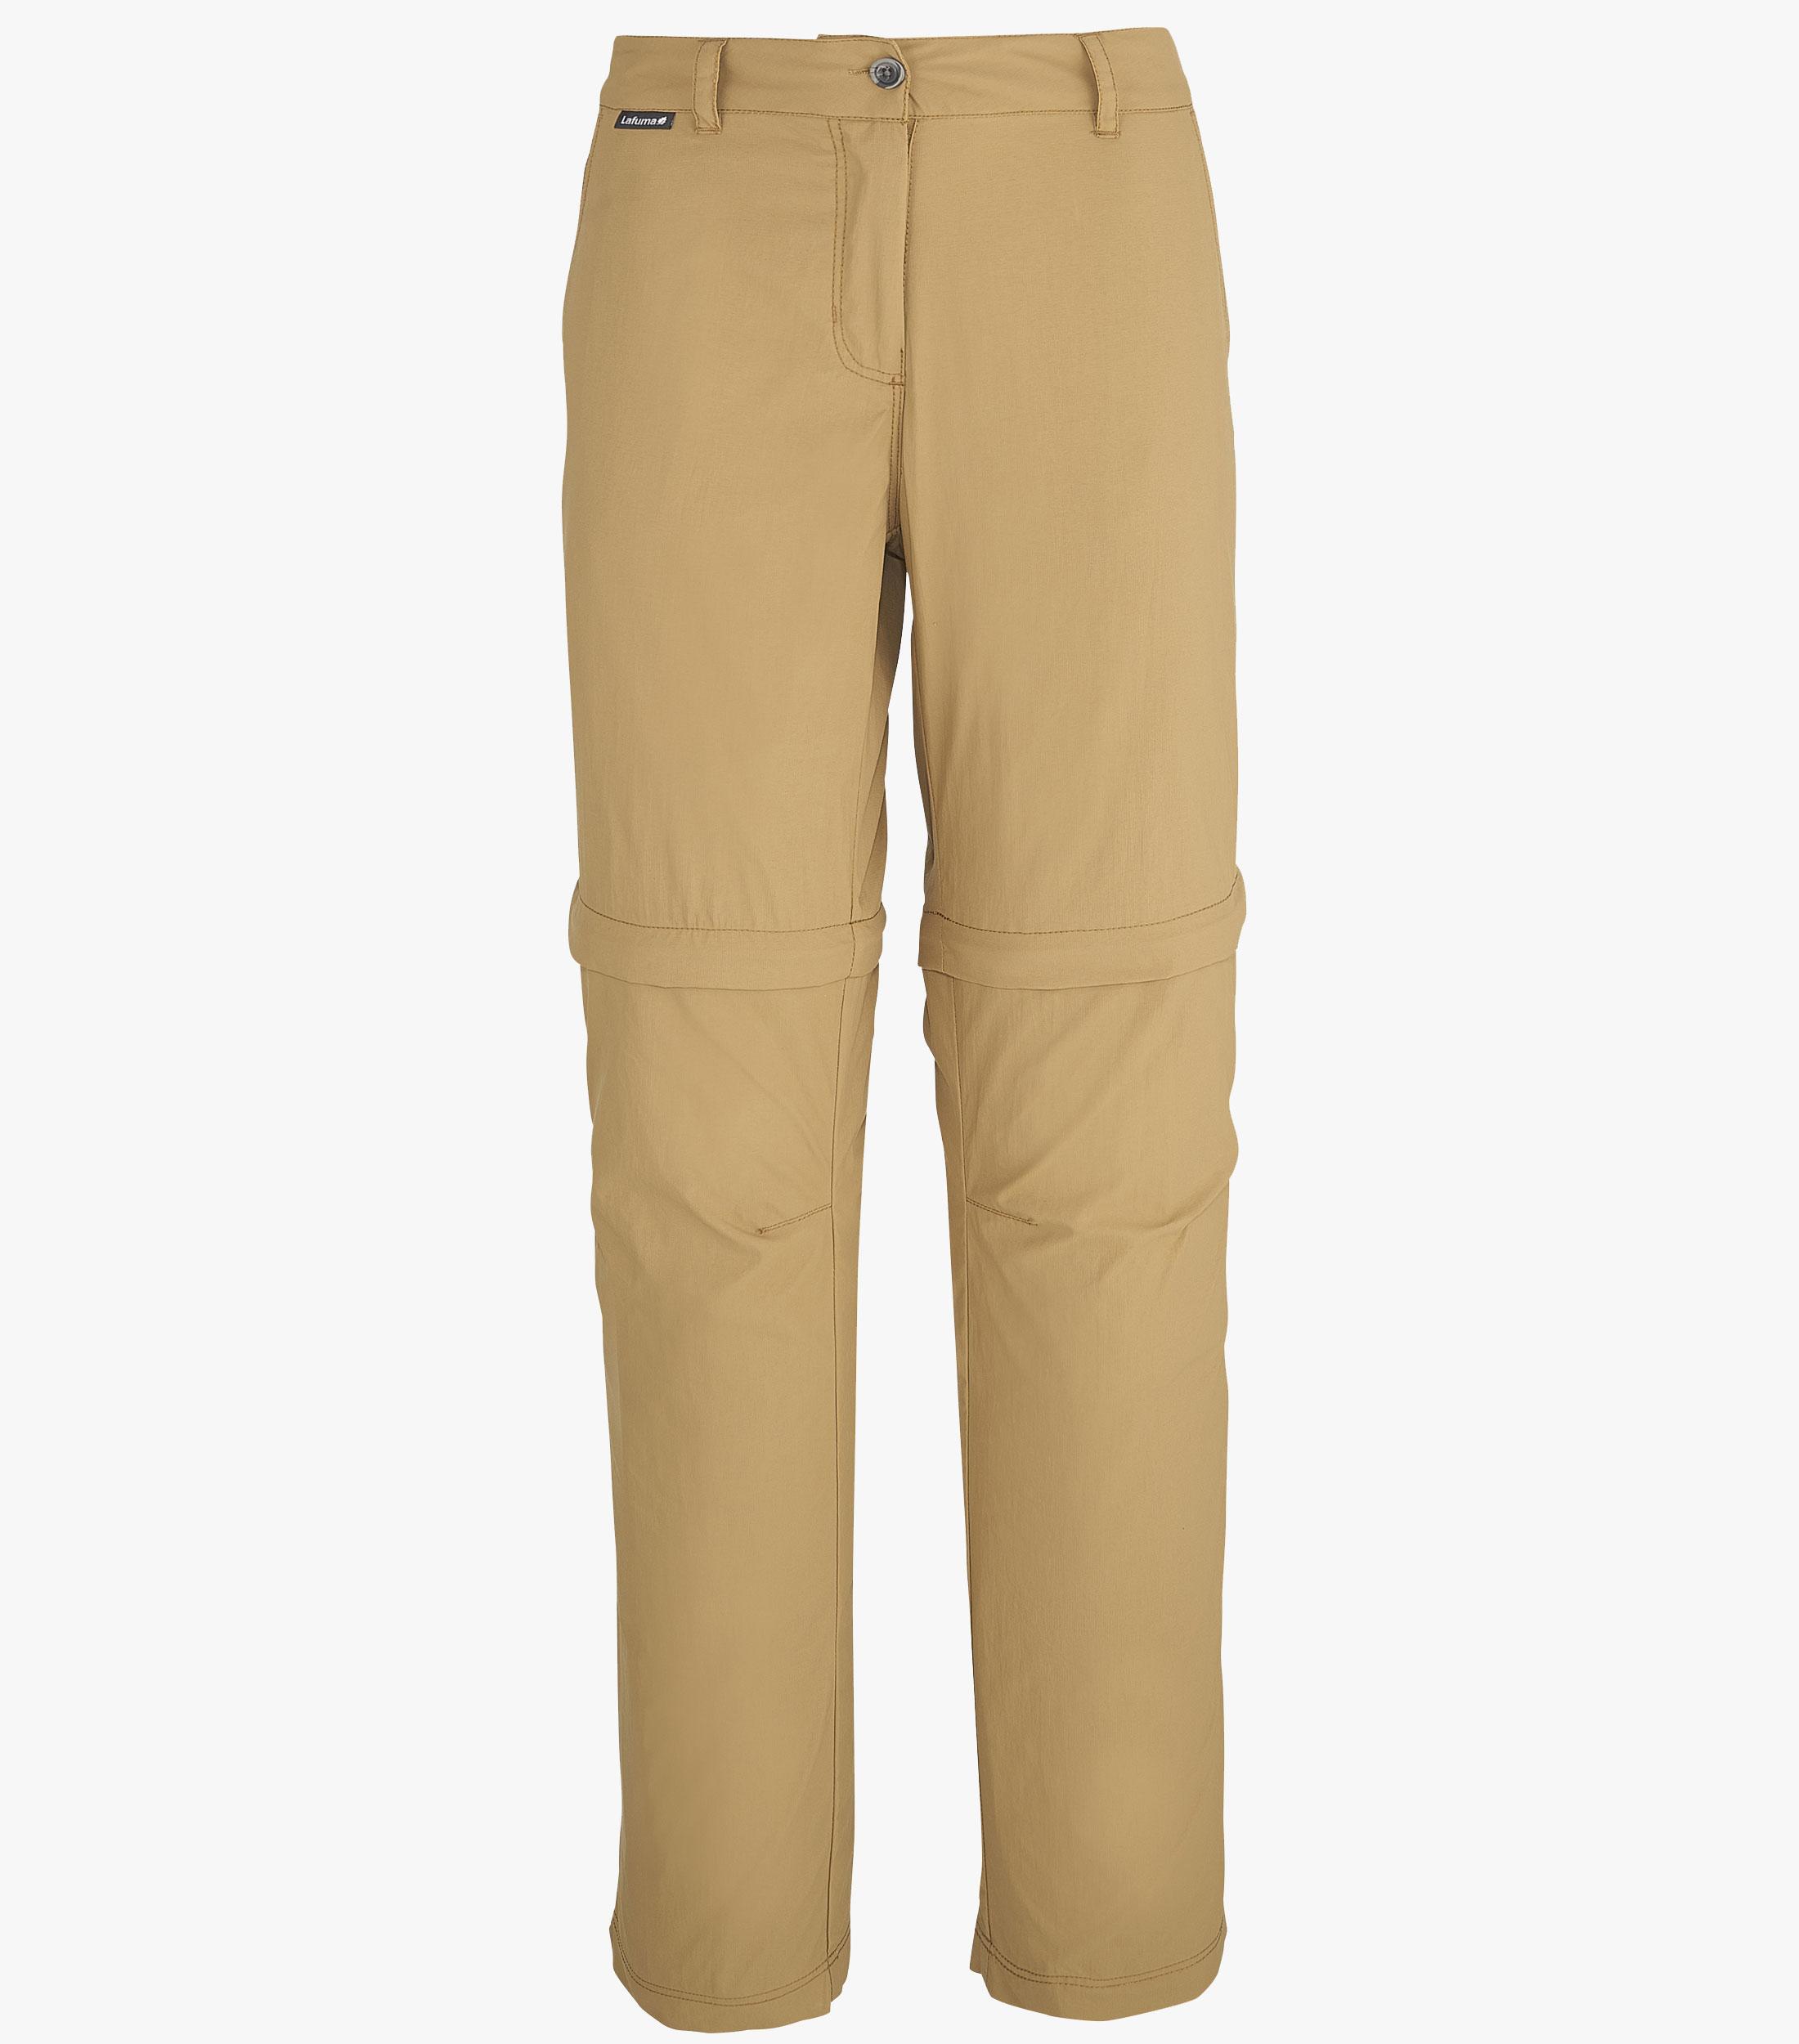 Женские брюки для активного отдыха Lafuma LD ACCESS PANTS ANTIQUE BRONZE - артикул: 888830349